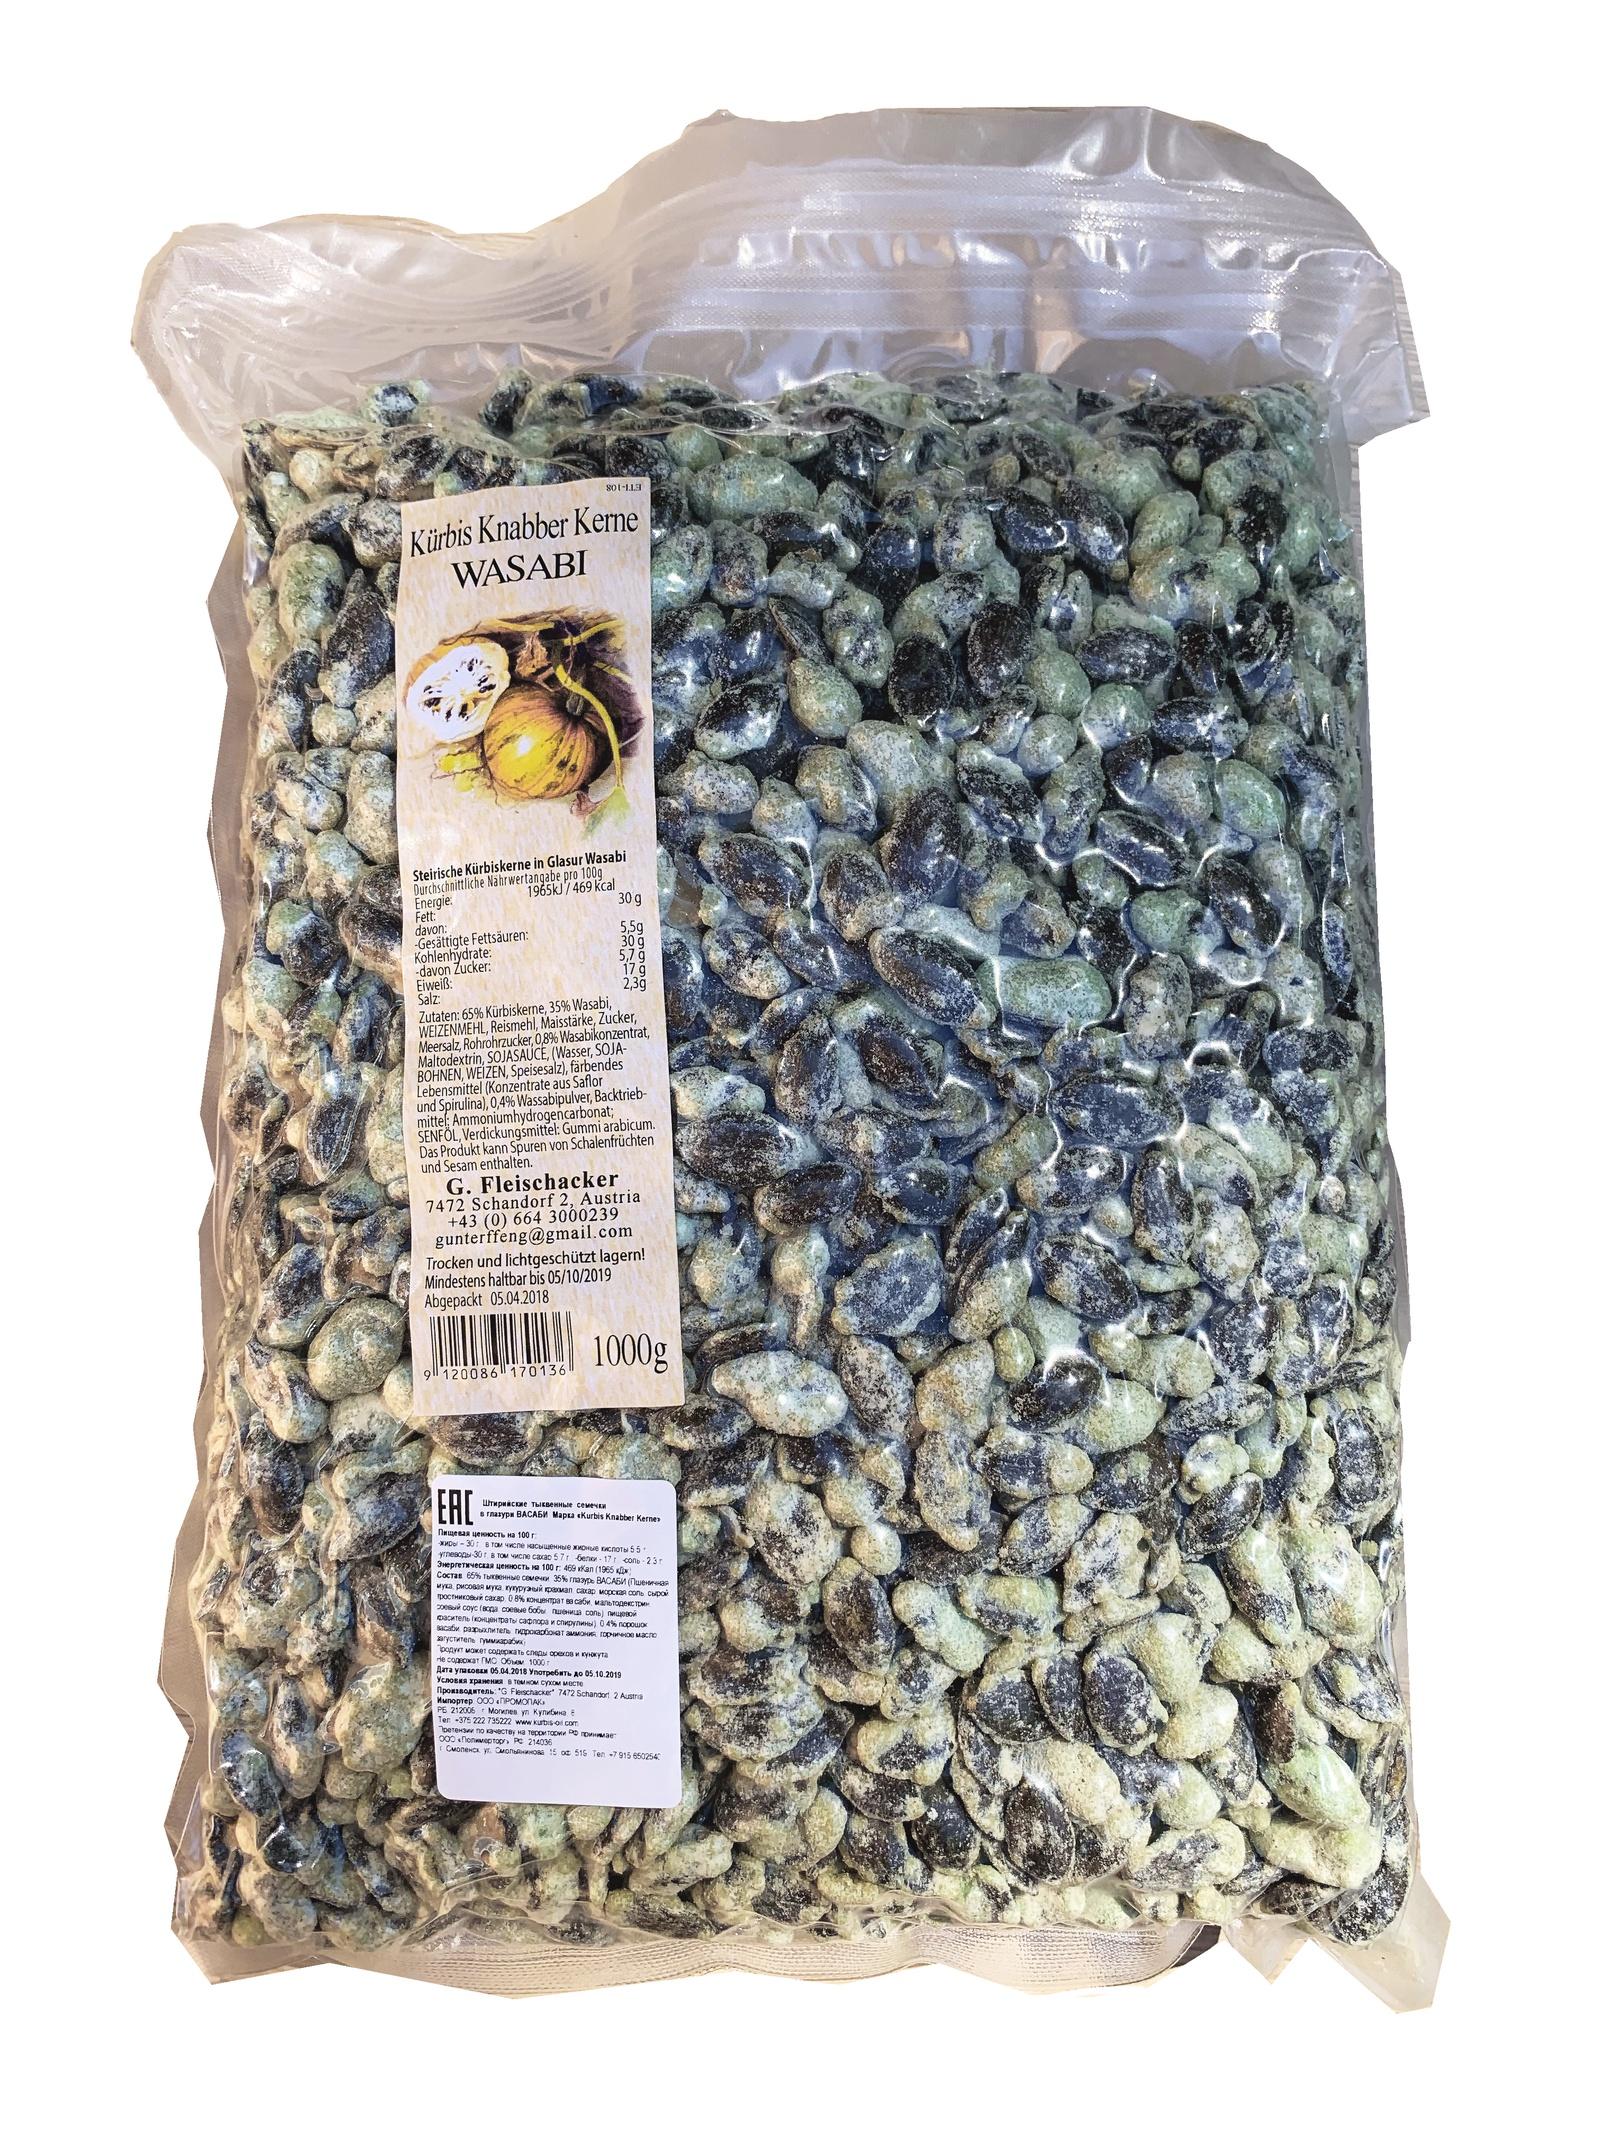 Штирийские тыквенные семечки в глазури васаби Kurbis Knabber Kerne, 1 кг